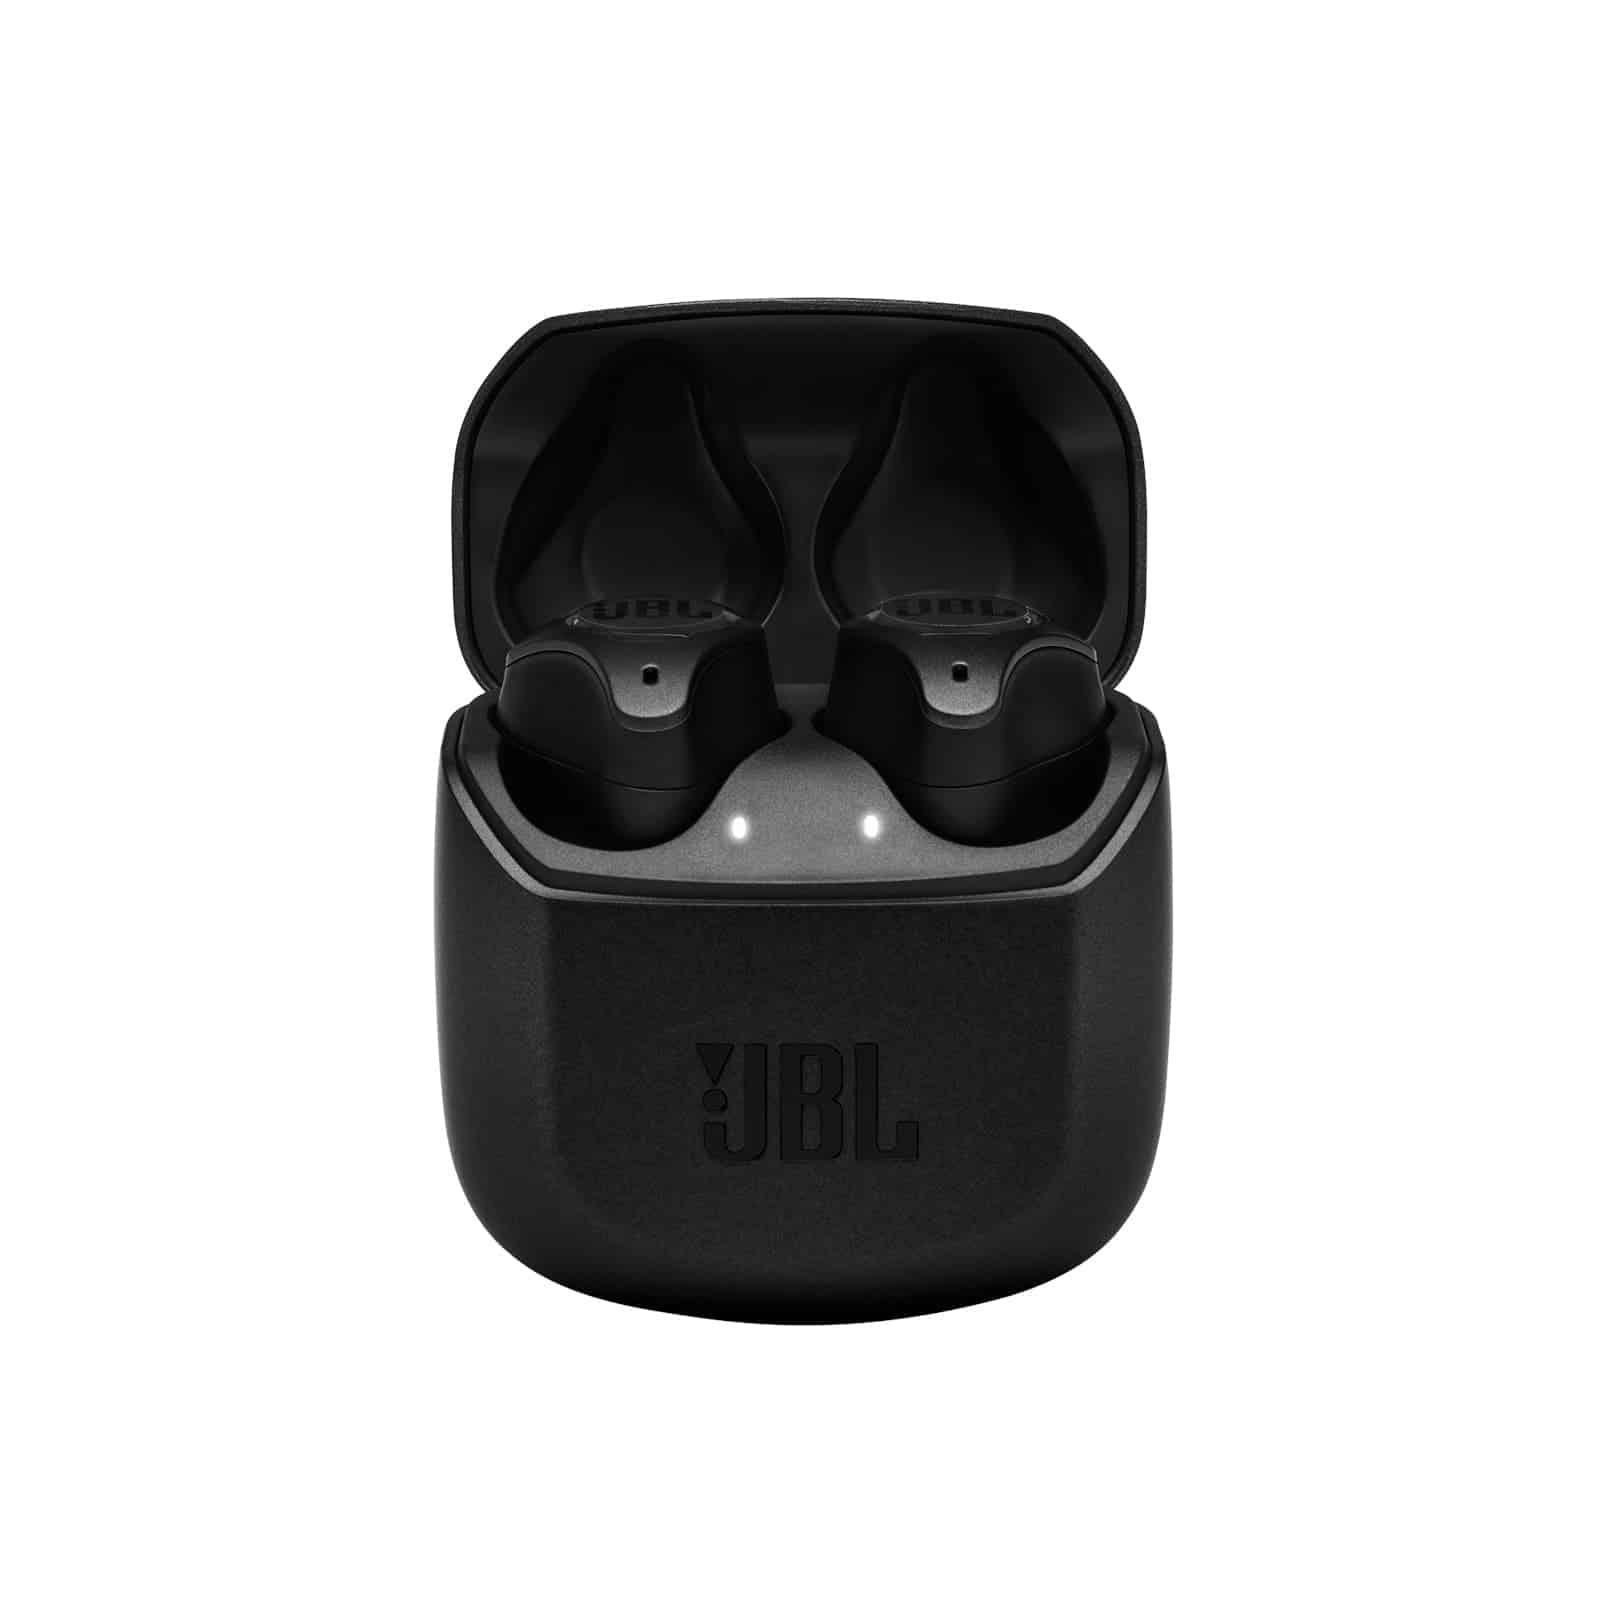 JBL Club Pro True Wireless Earbuds 3